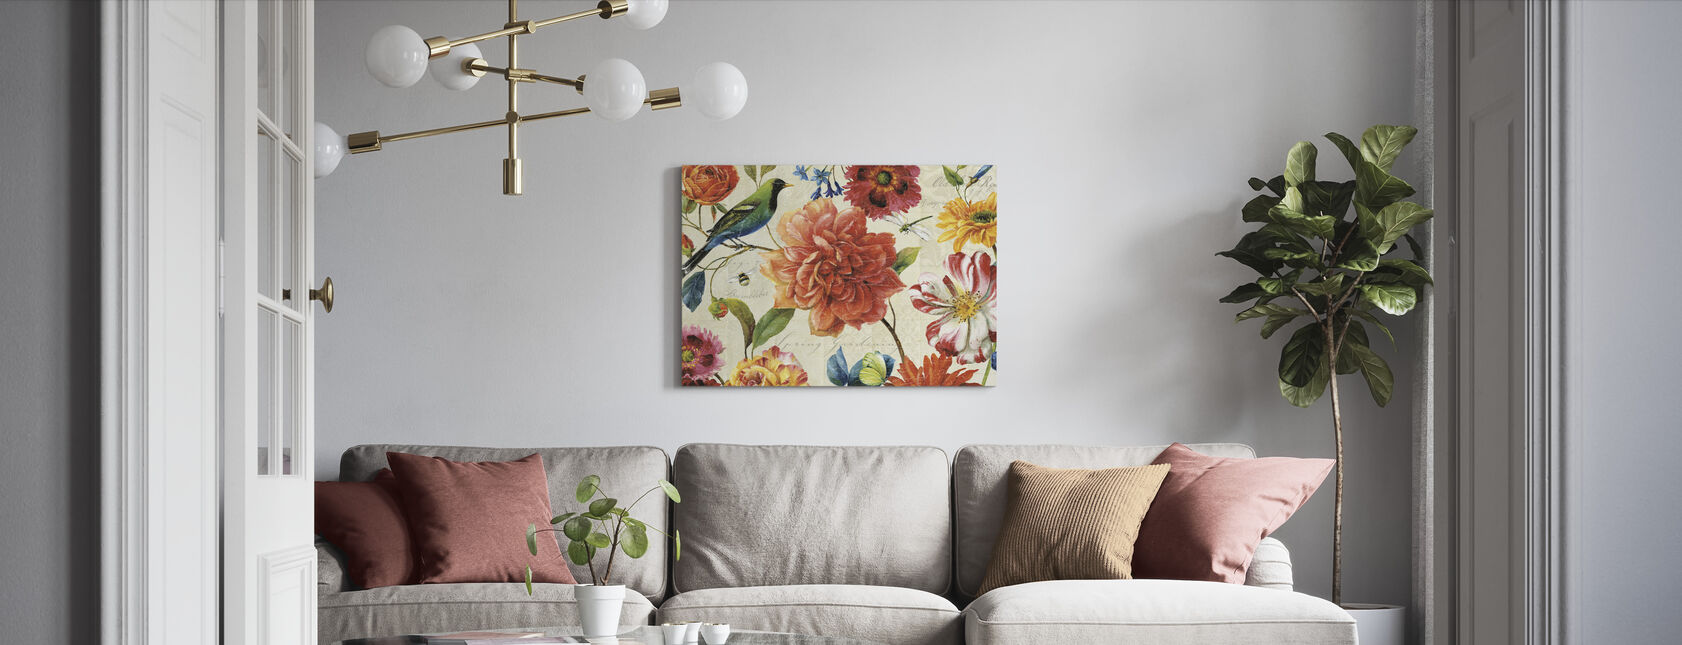 Regenboog Tuin Crème - Canvas print - Woonkamer